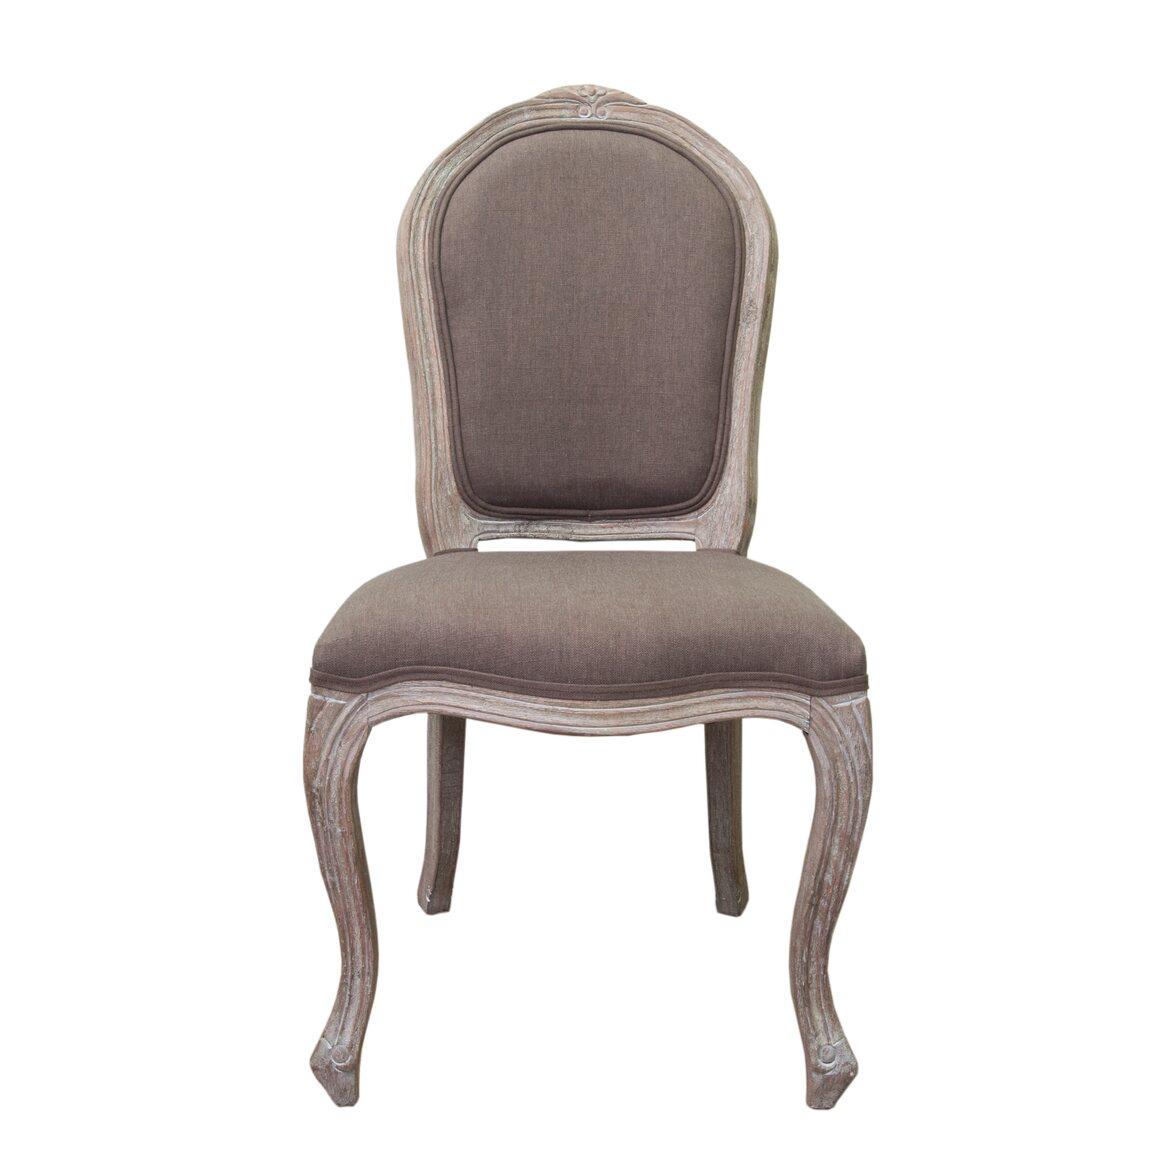 Стул Grand brown | Обеденные стулья Kingsby